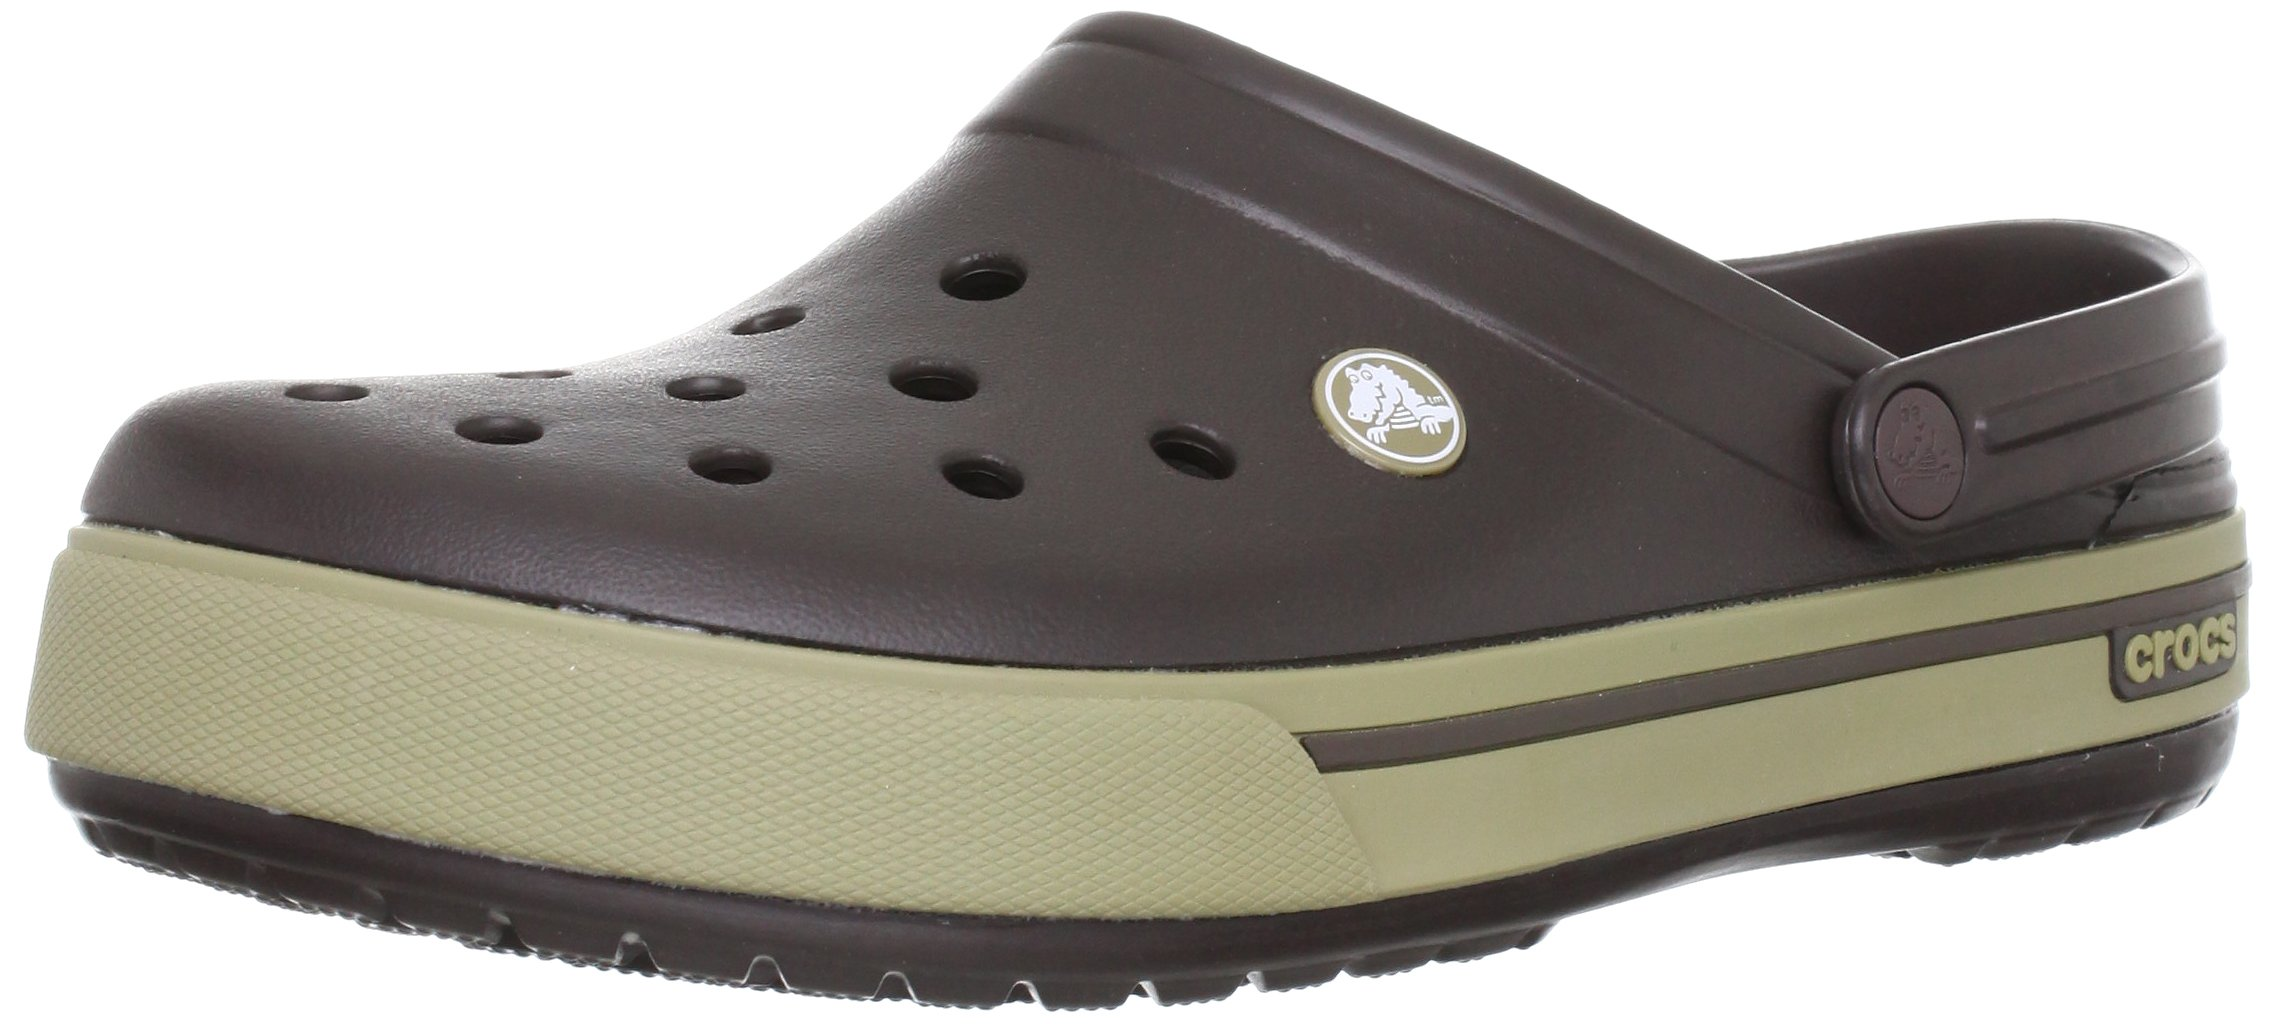 Crocs Crocband II.5 Clog, Zuecos Unisex Adulto